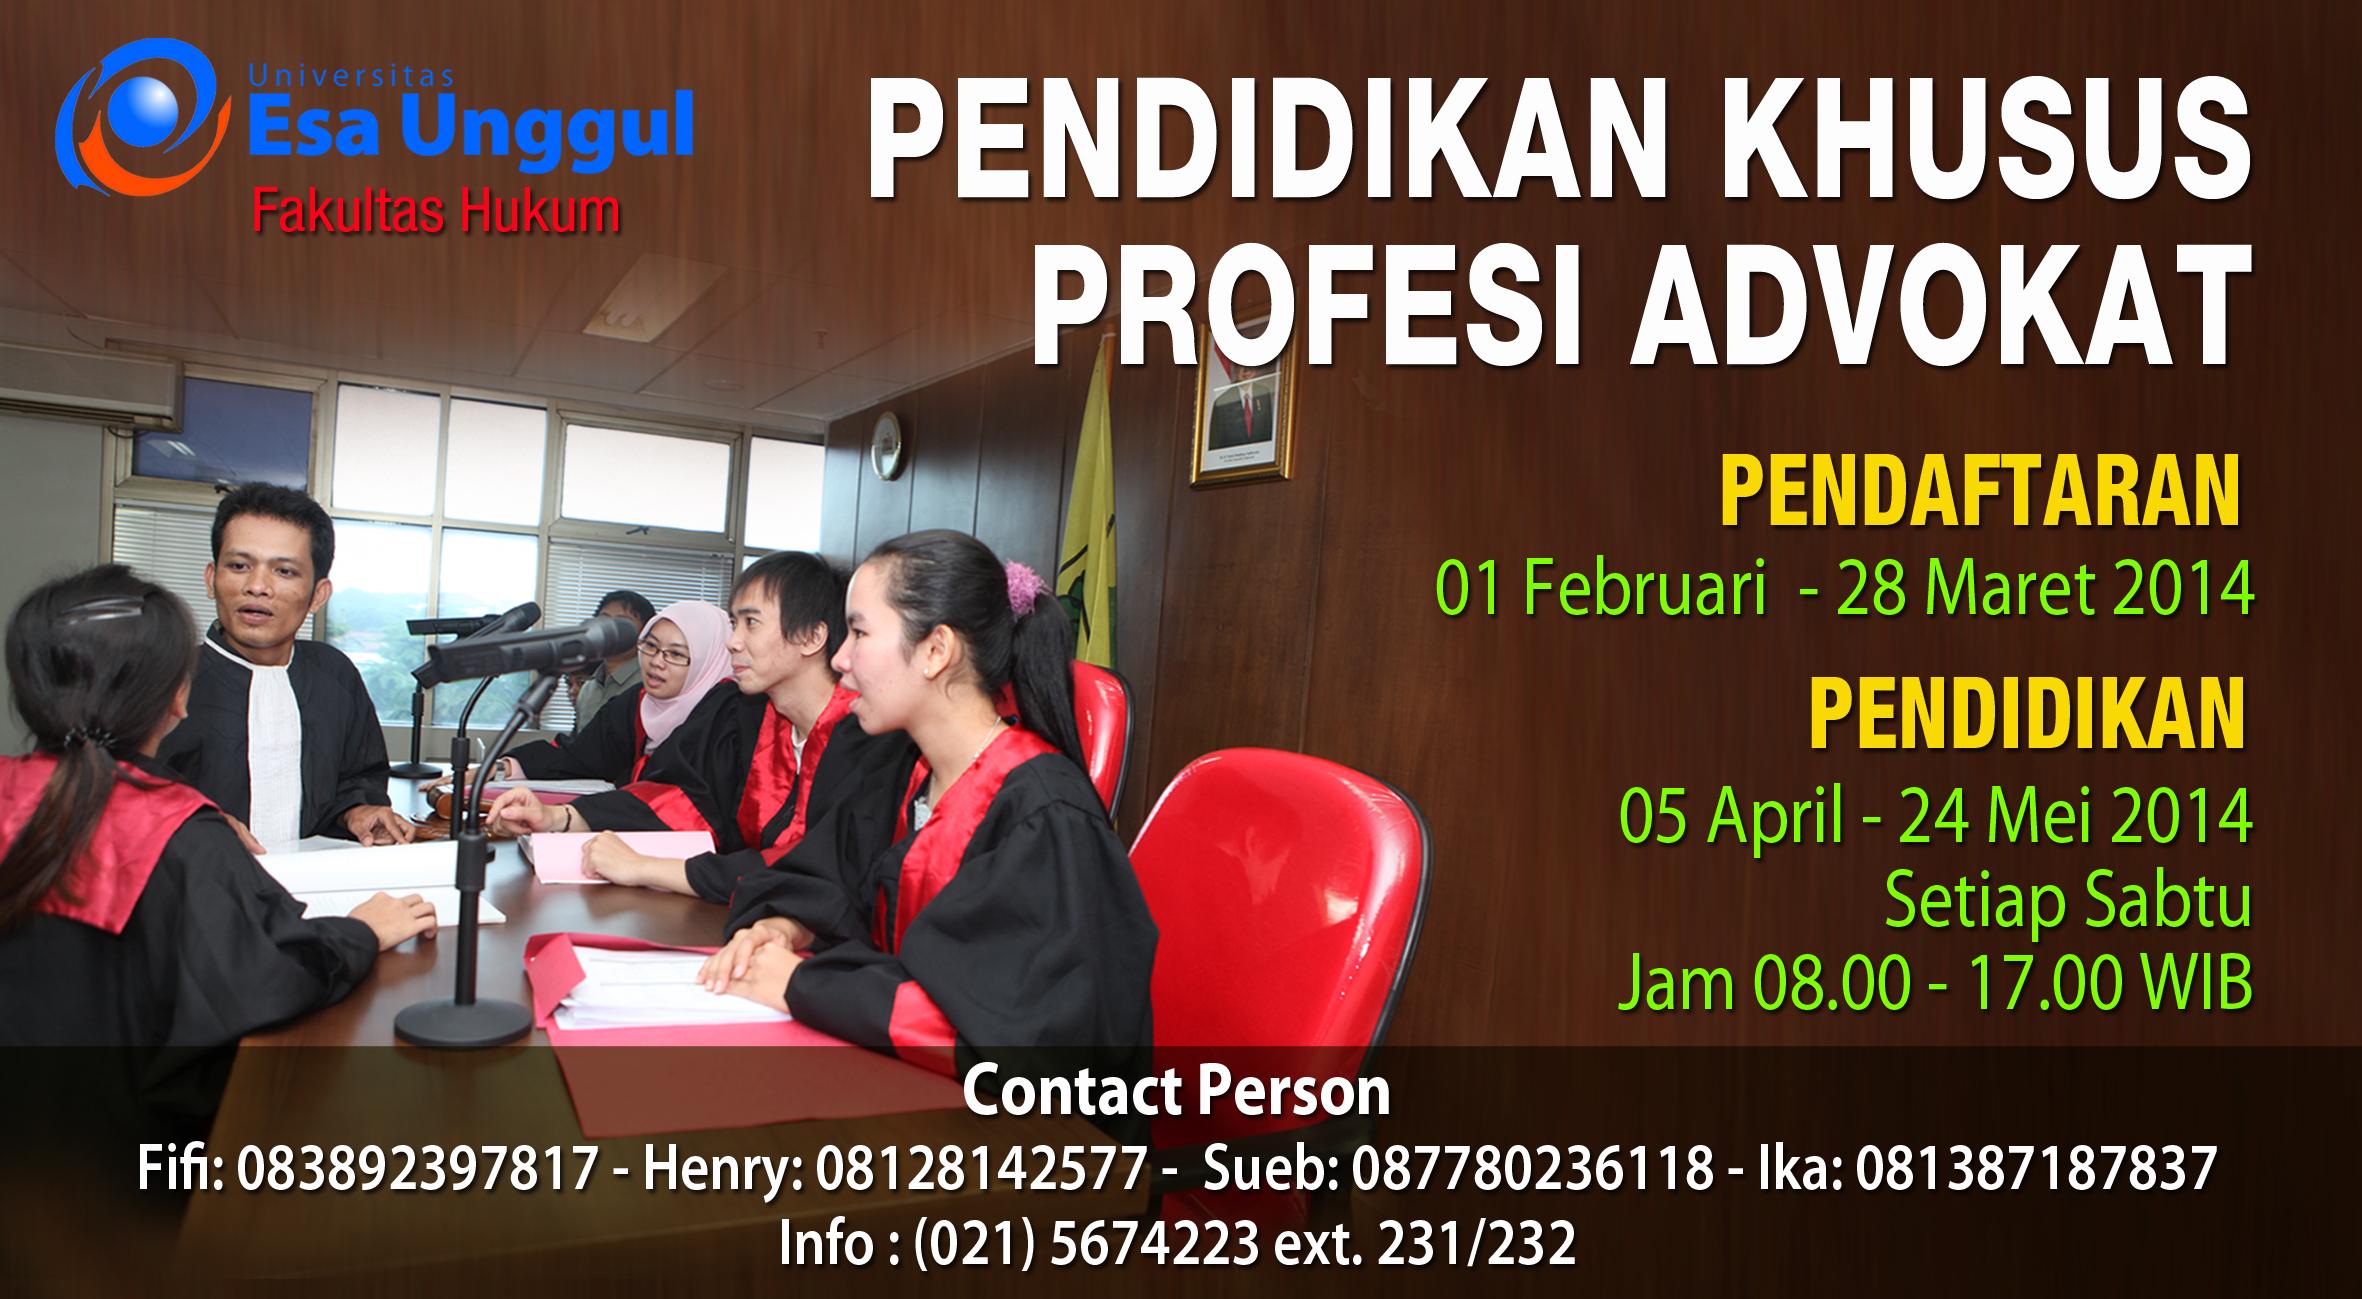 Fakultas Hukum UEU bekerjasama dengan PERADI menyelenggarakan Pendidikan Khusus Profesi Advokat